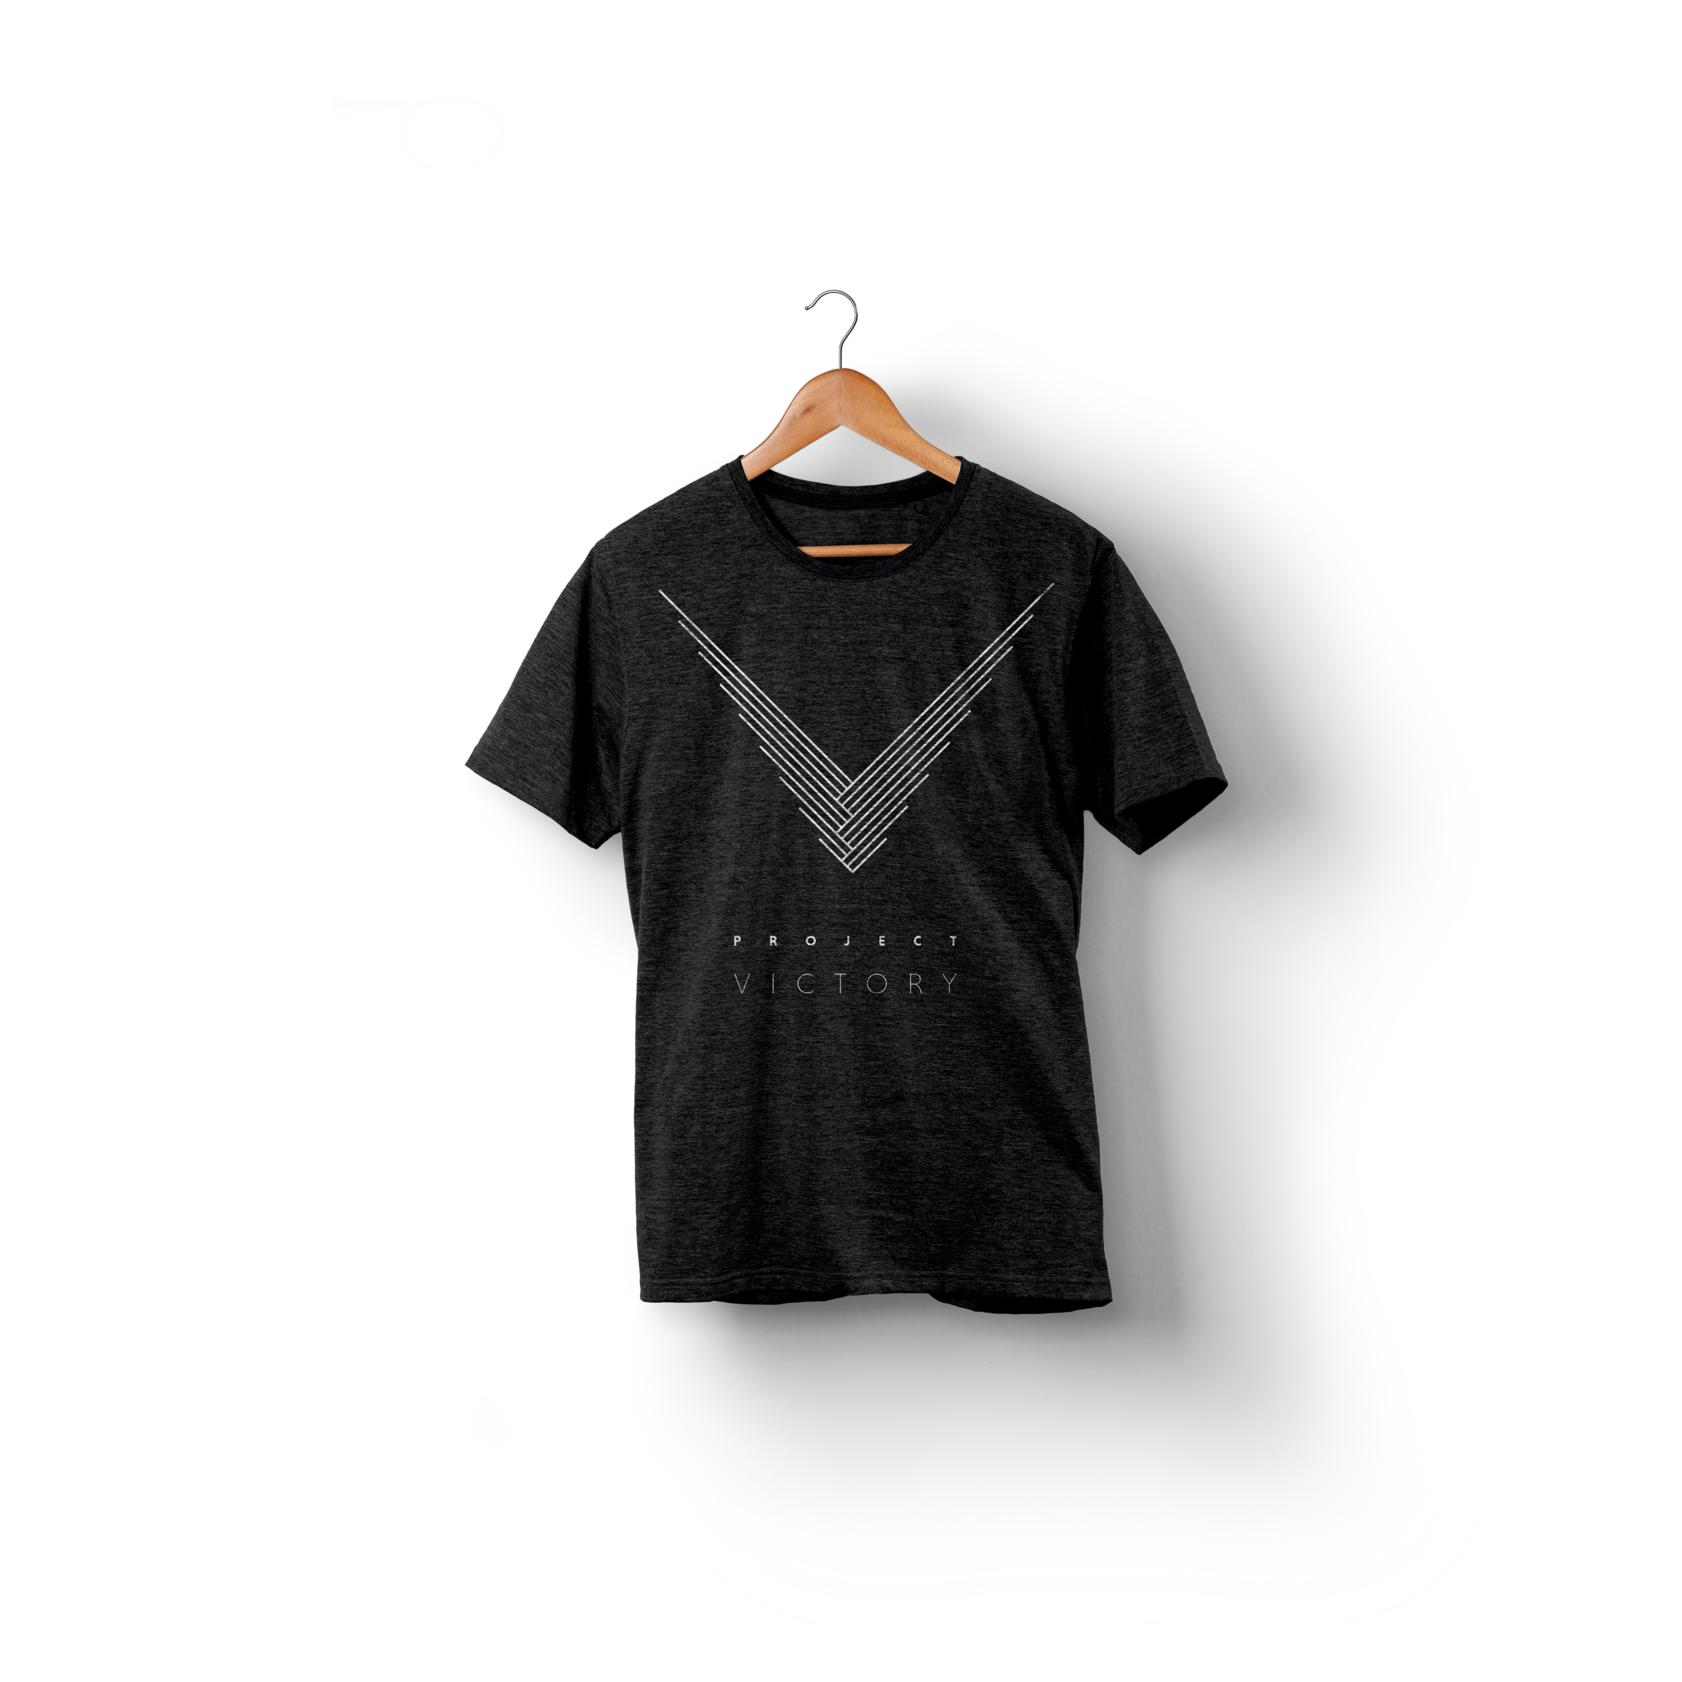 projectvictory_branding_tshirt